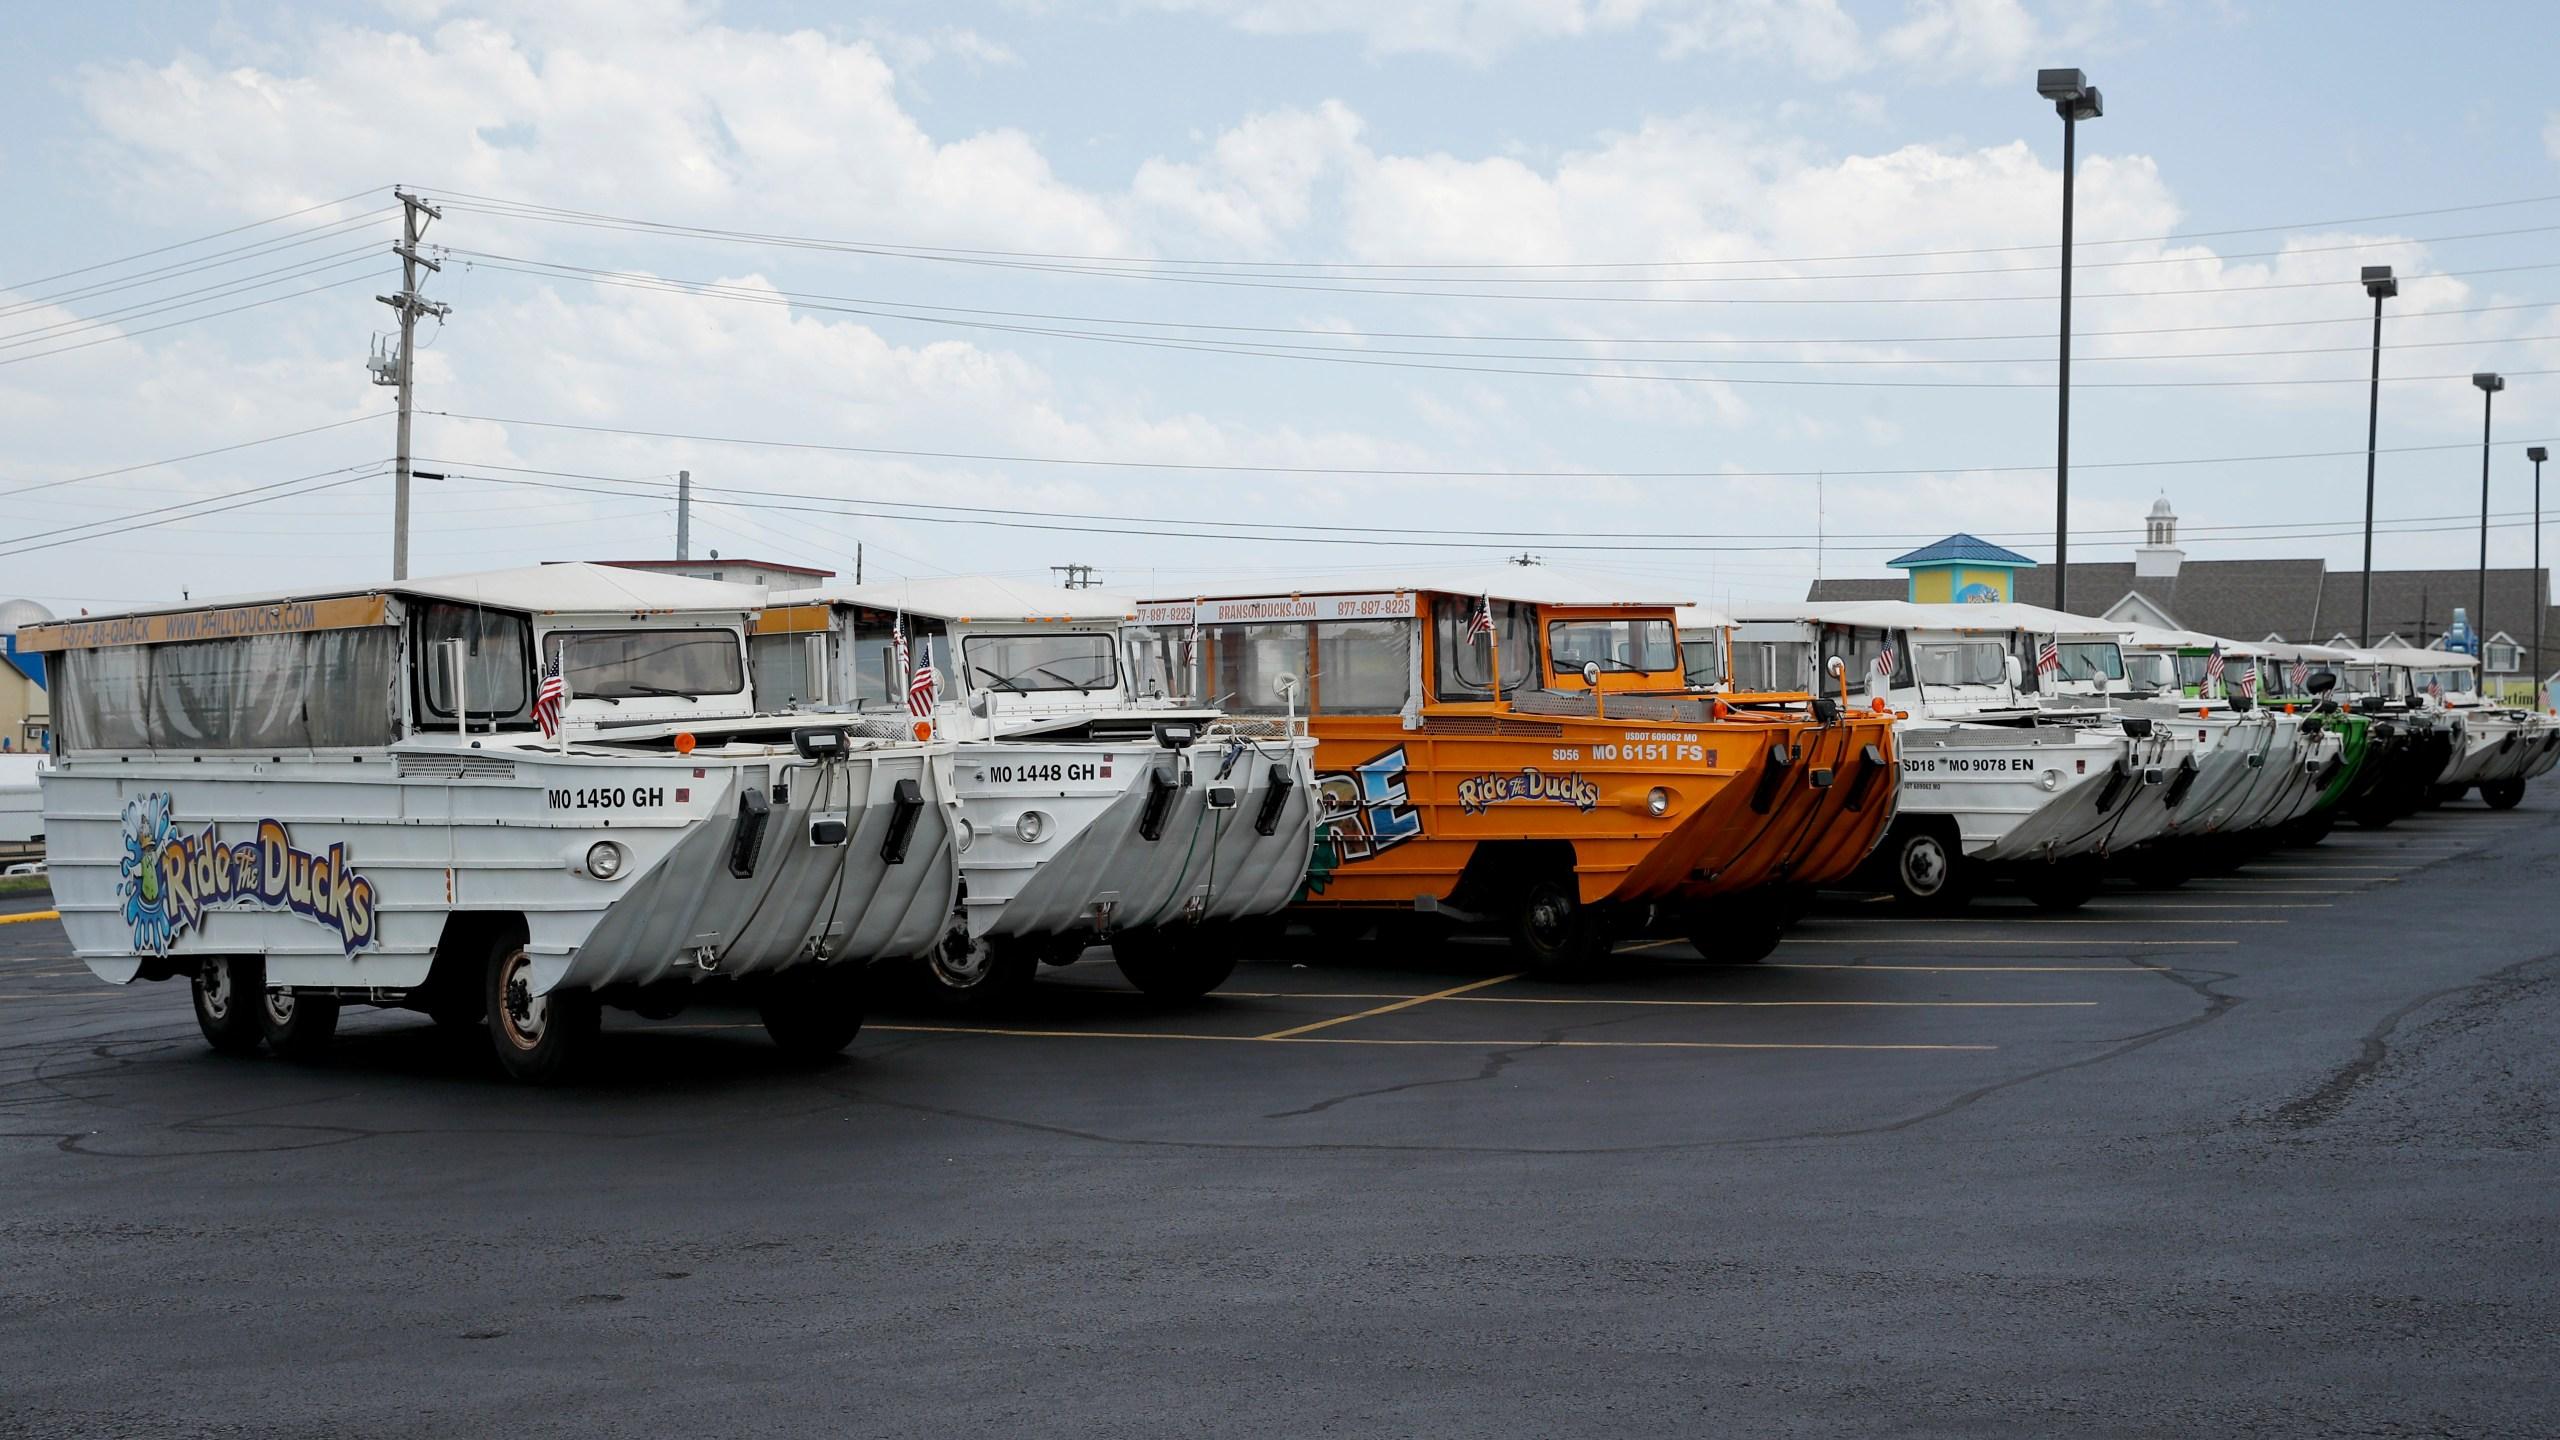 Missouri_Boat_Accident_Duck_Boats_13033-159532.jpg06028532